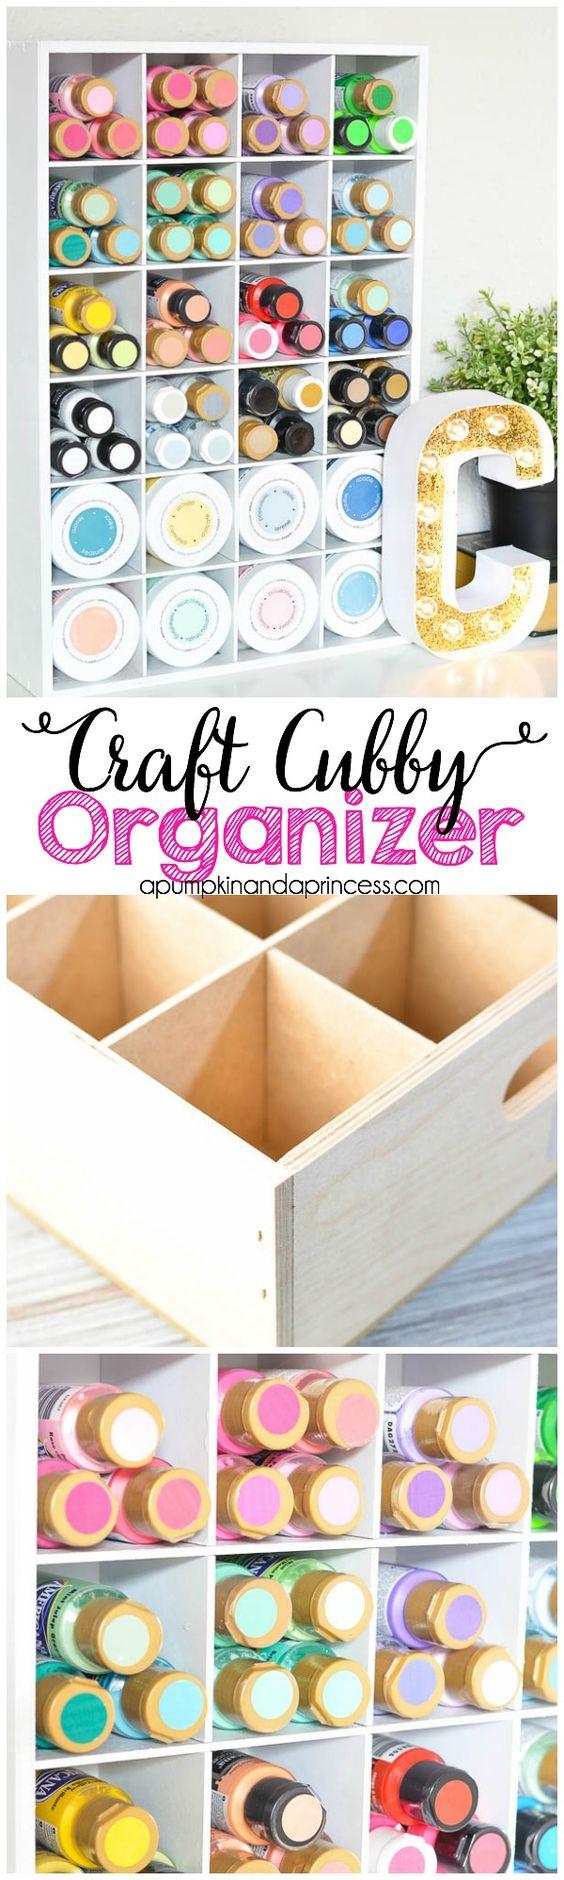 cubby-storage